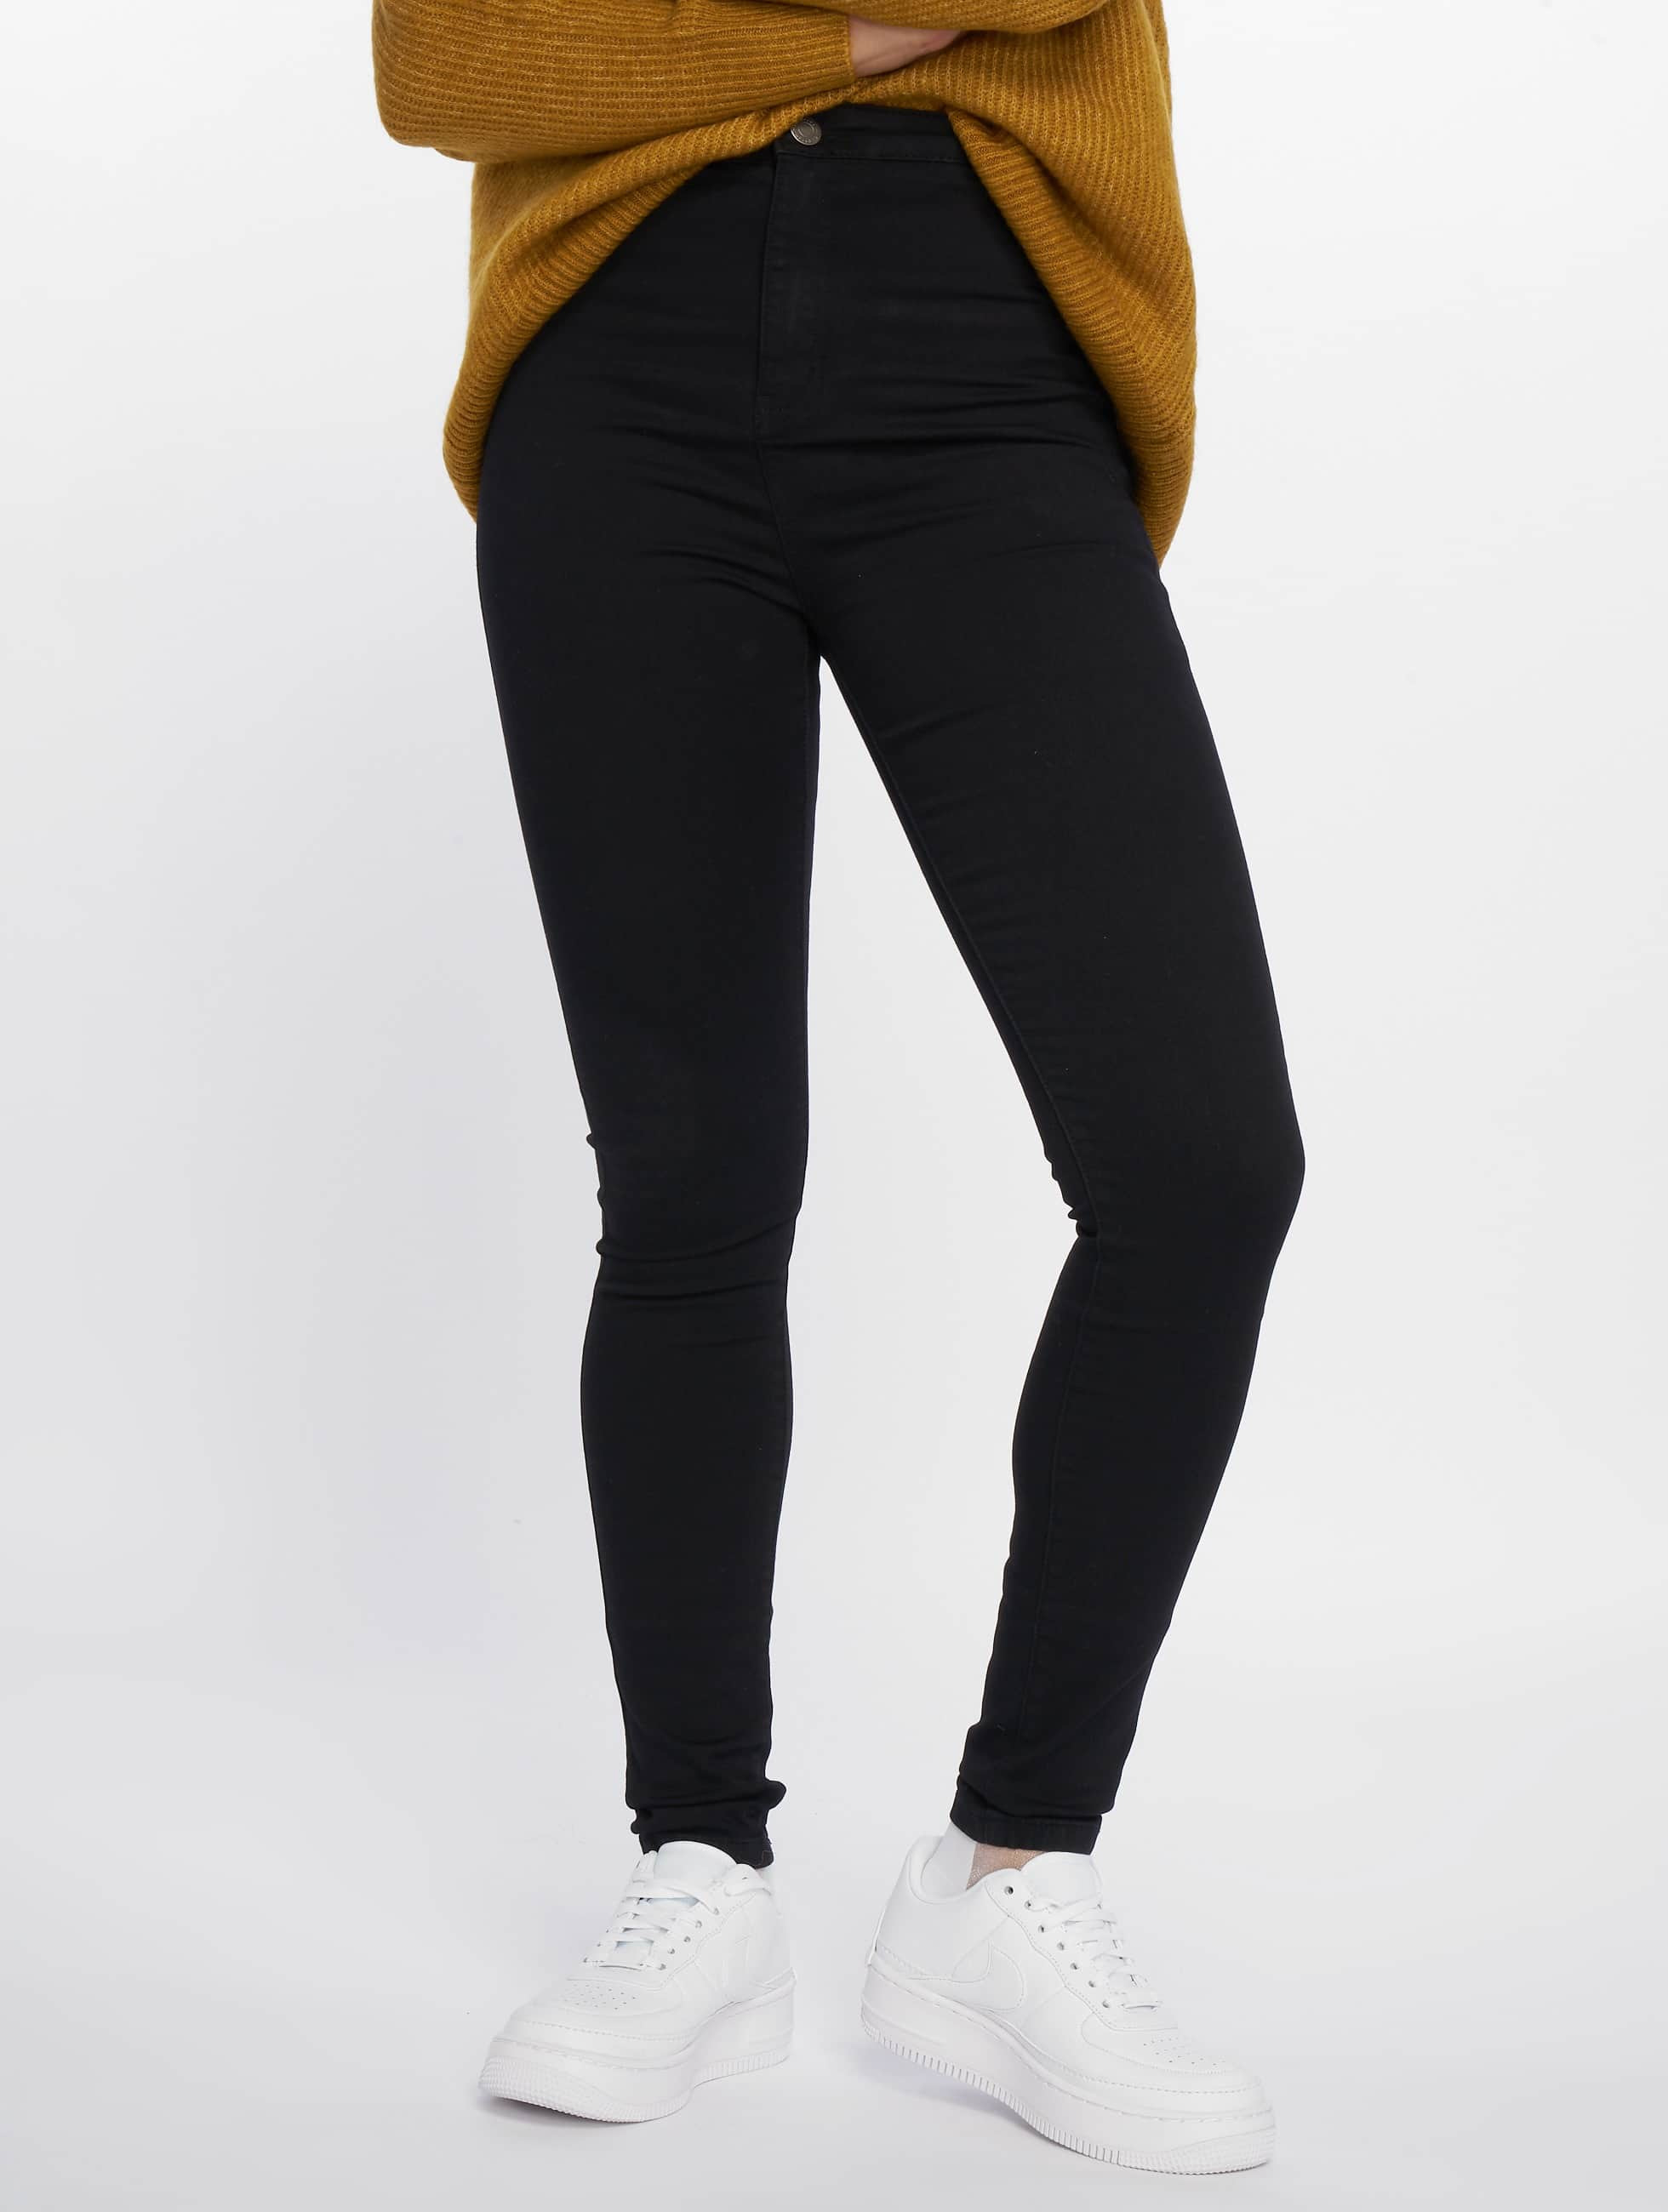 Noisy May Frauen High Waist Jeans nmEllaSuper High Waist in schwarz